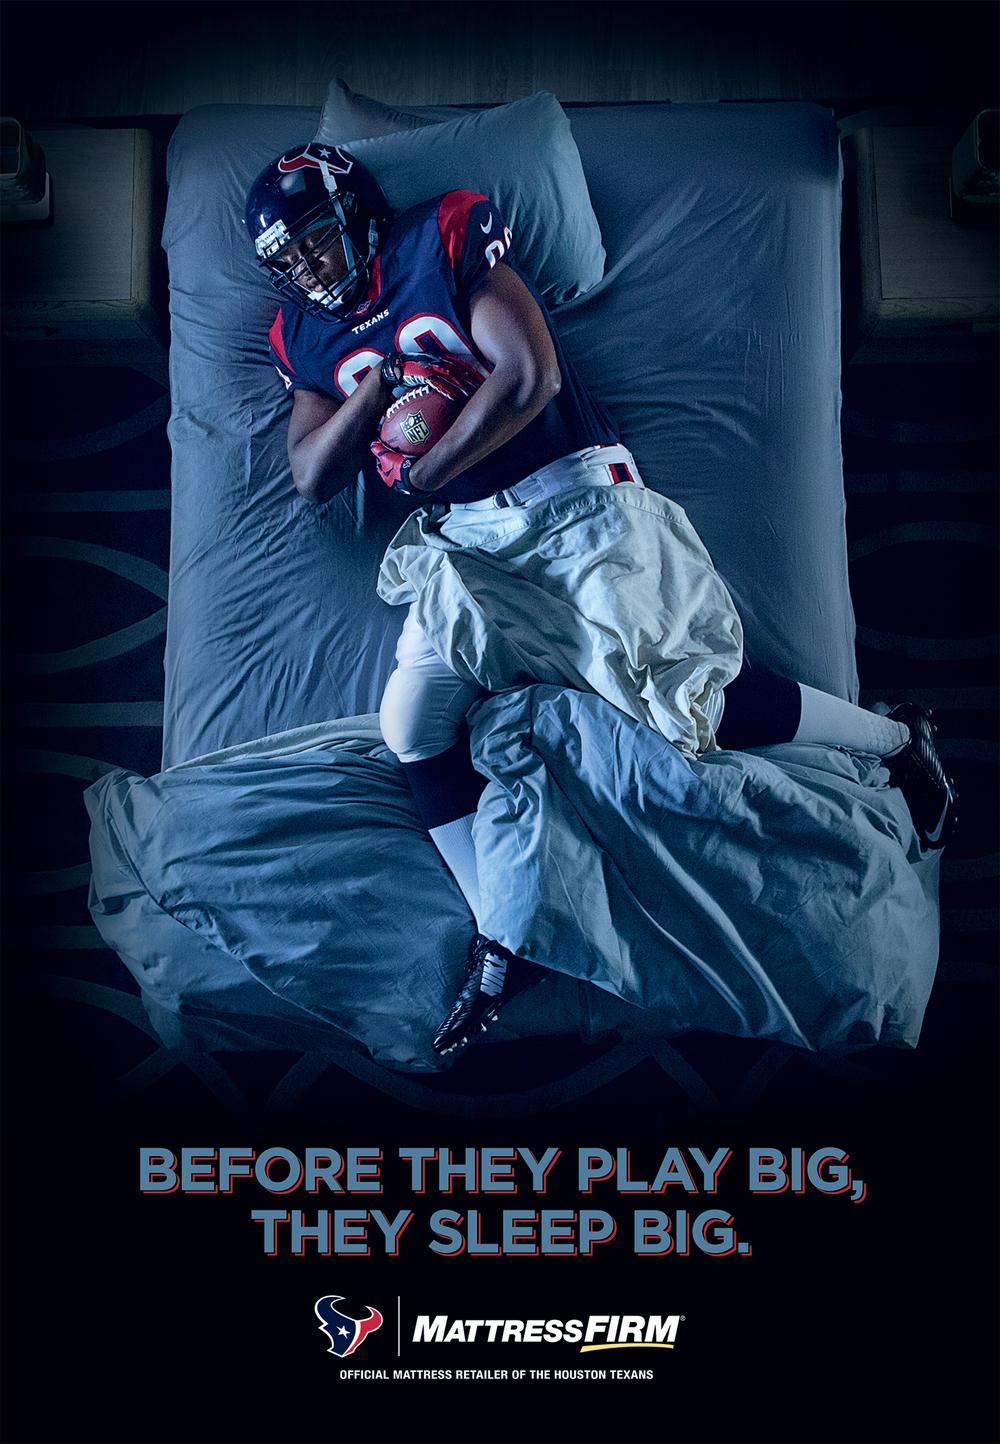 Texans_playBIG_small_2.jpg